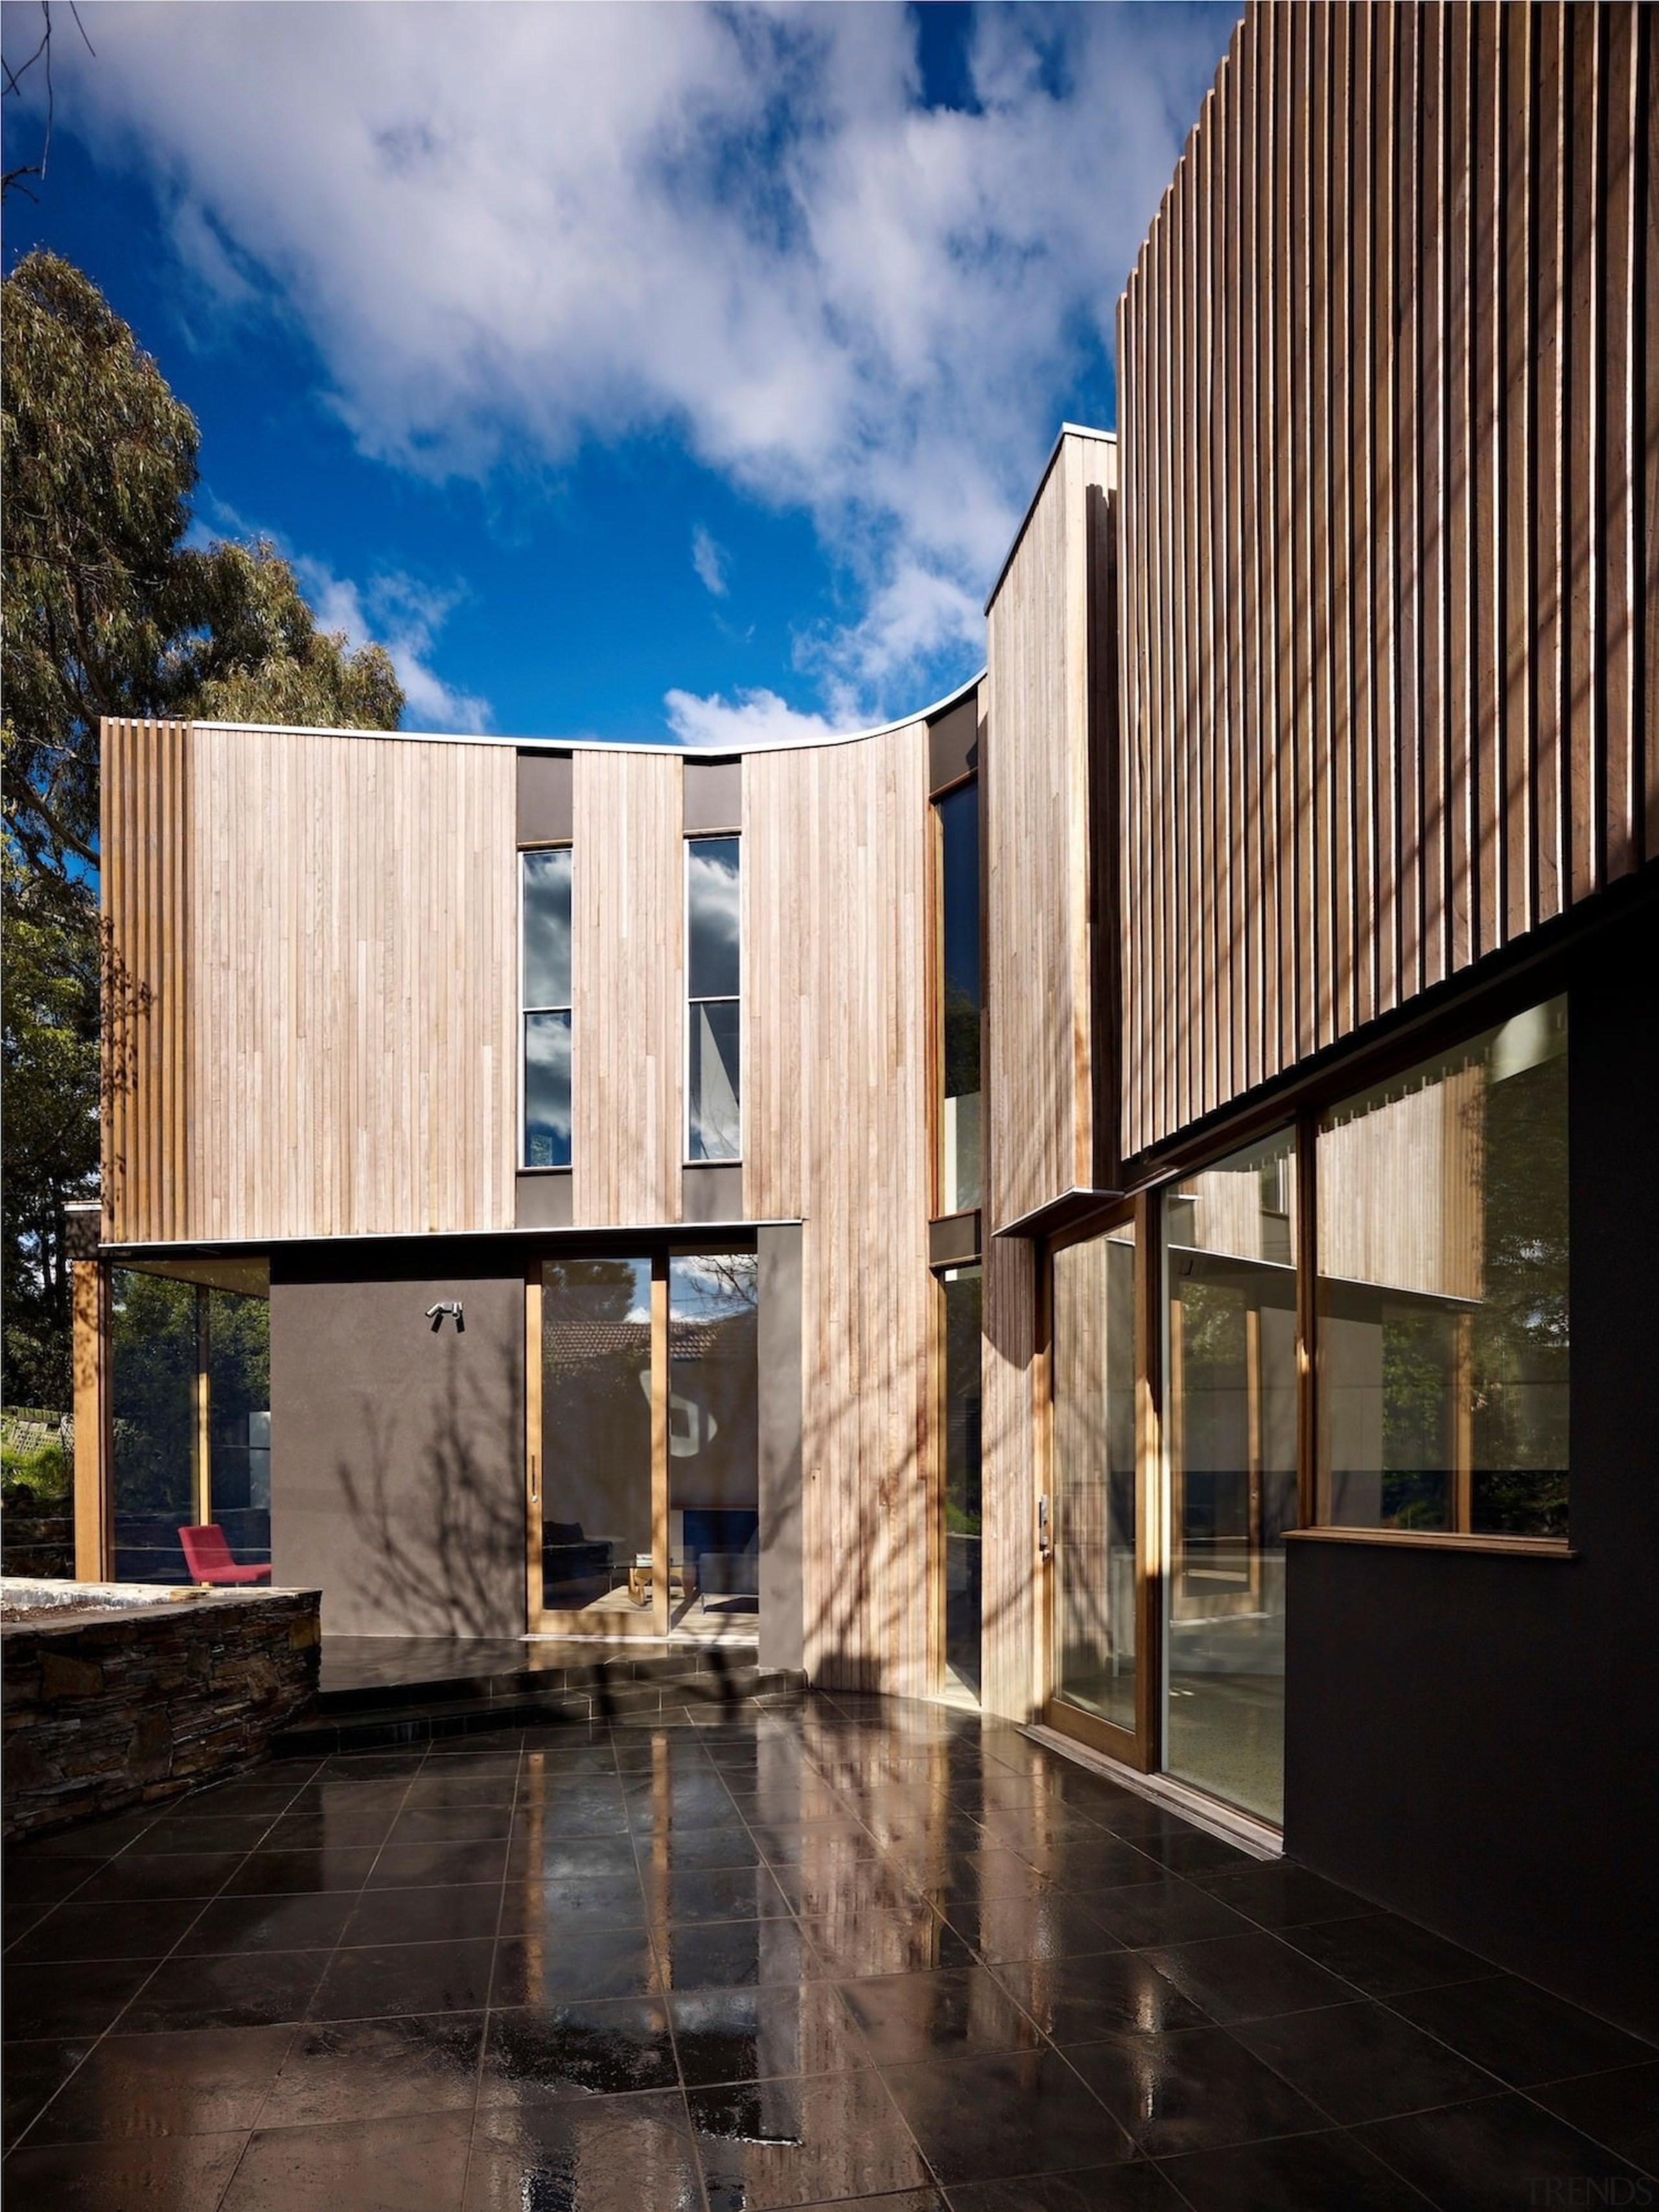 Architect: Steffen Welsch ArchitectsPhotography: Rhiannon Slatter apartment, architecture, building, condominium, facade, home, house, real estate, reflection, residential area, sky, wood, black